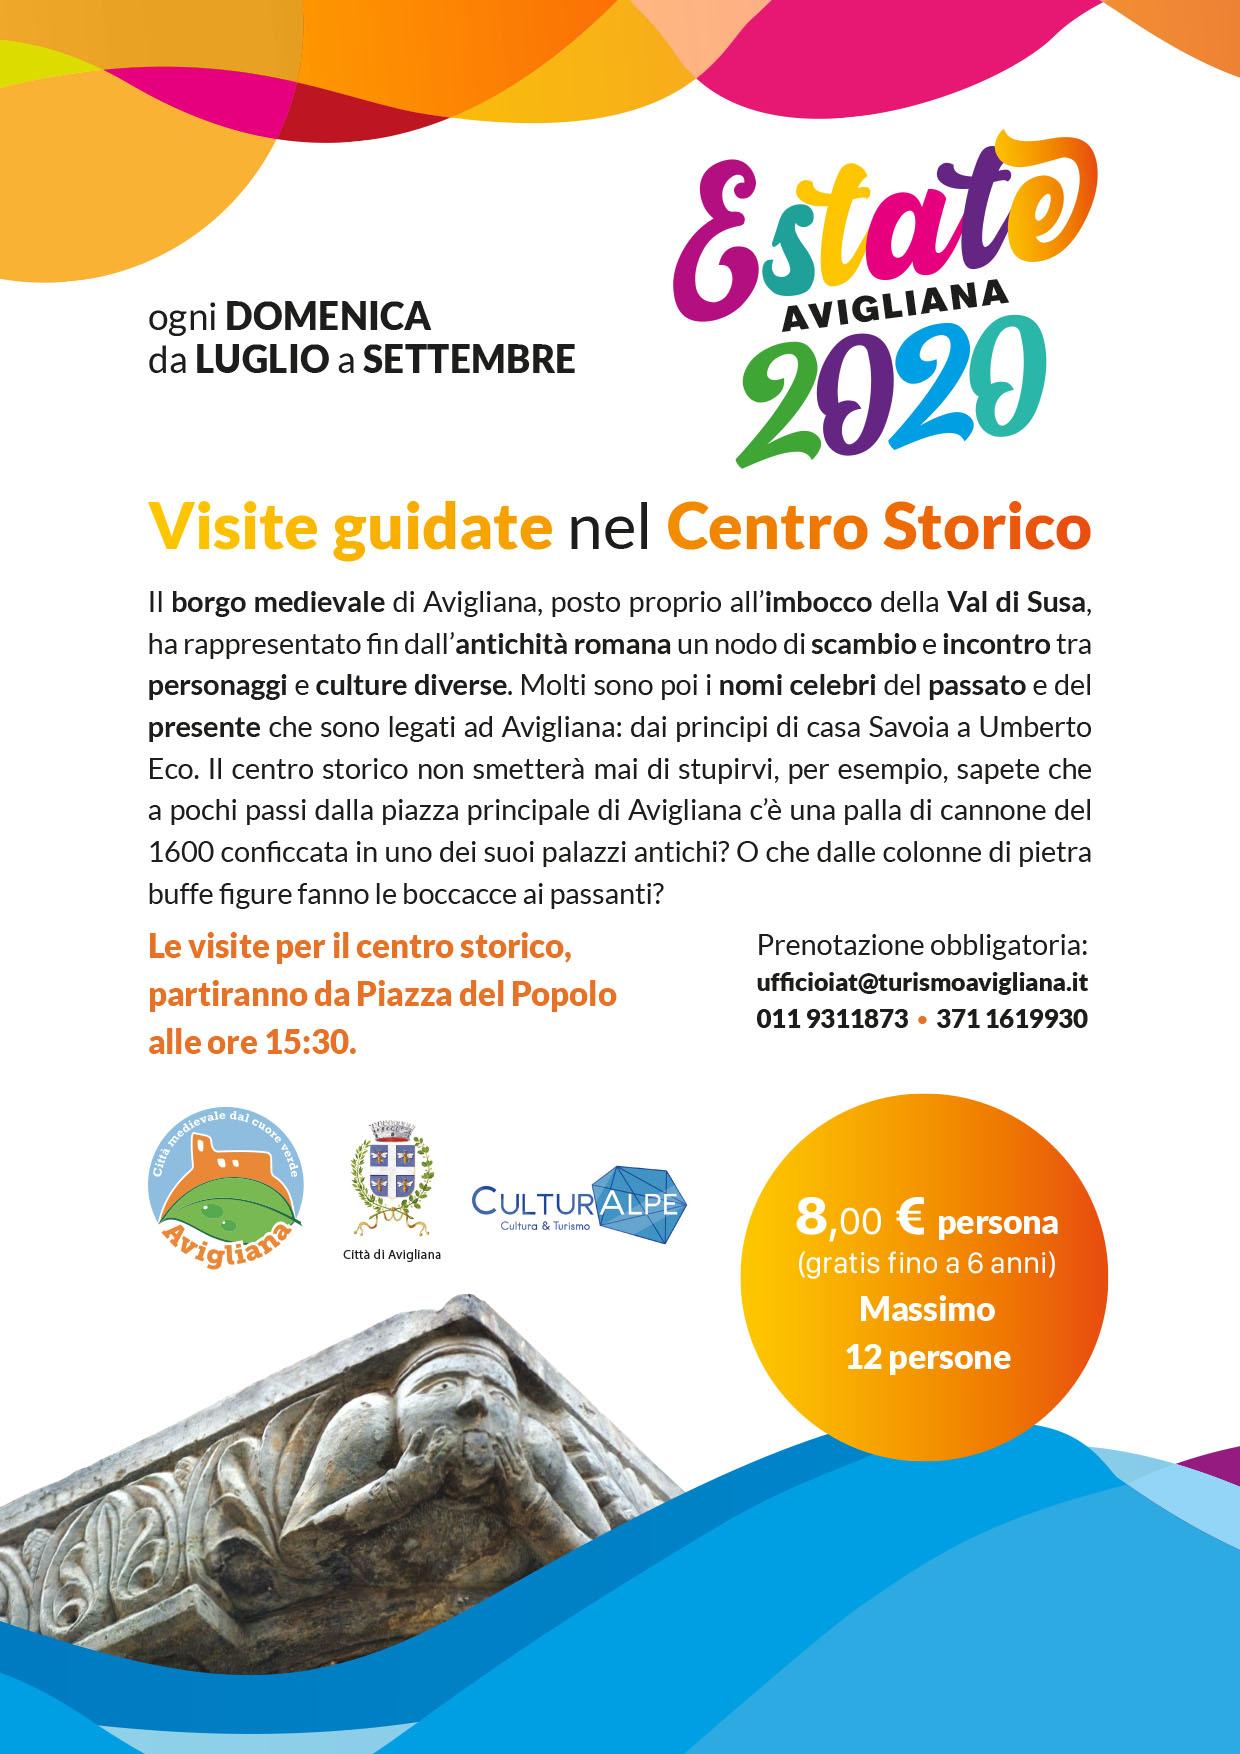 Estate 2020_Tour_Centro_Storico_Avigliana